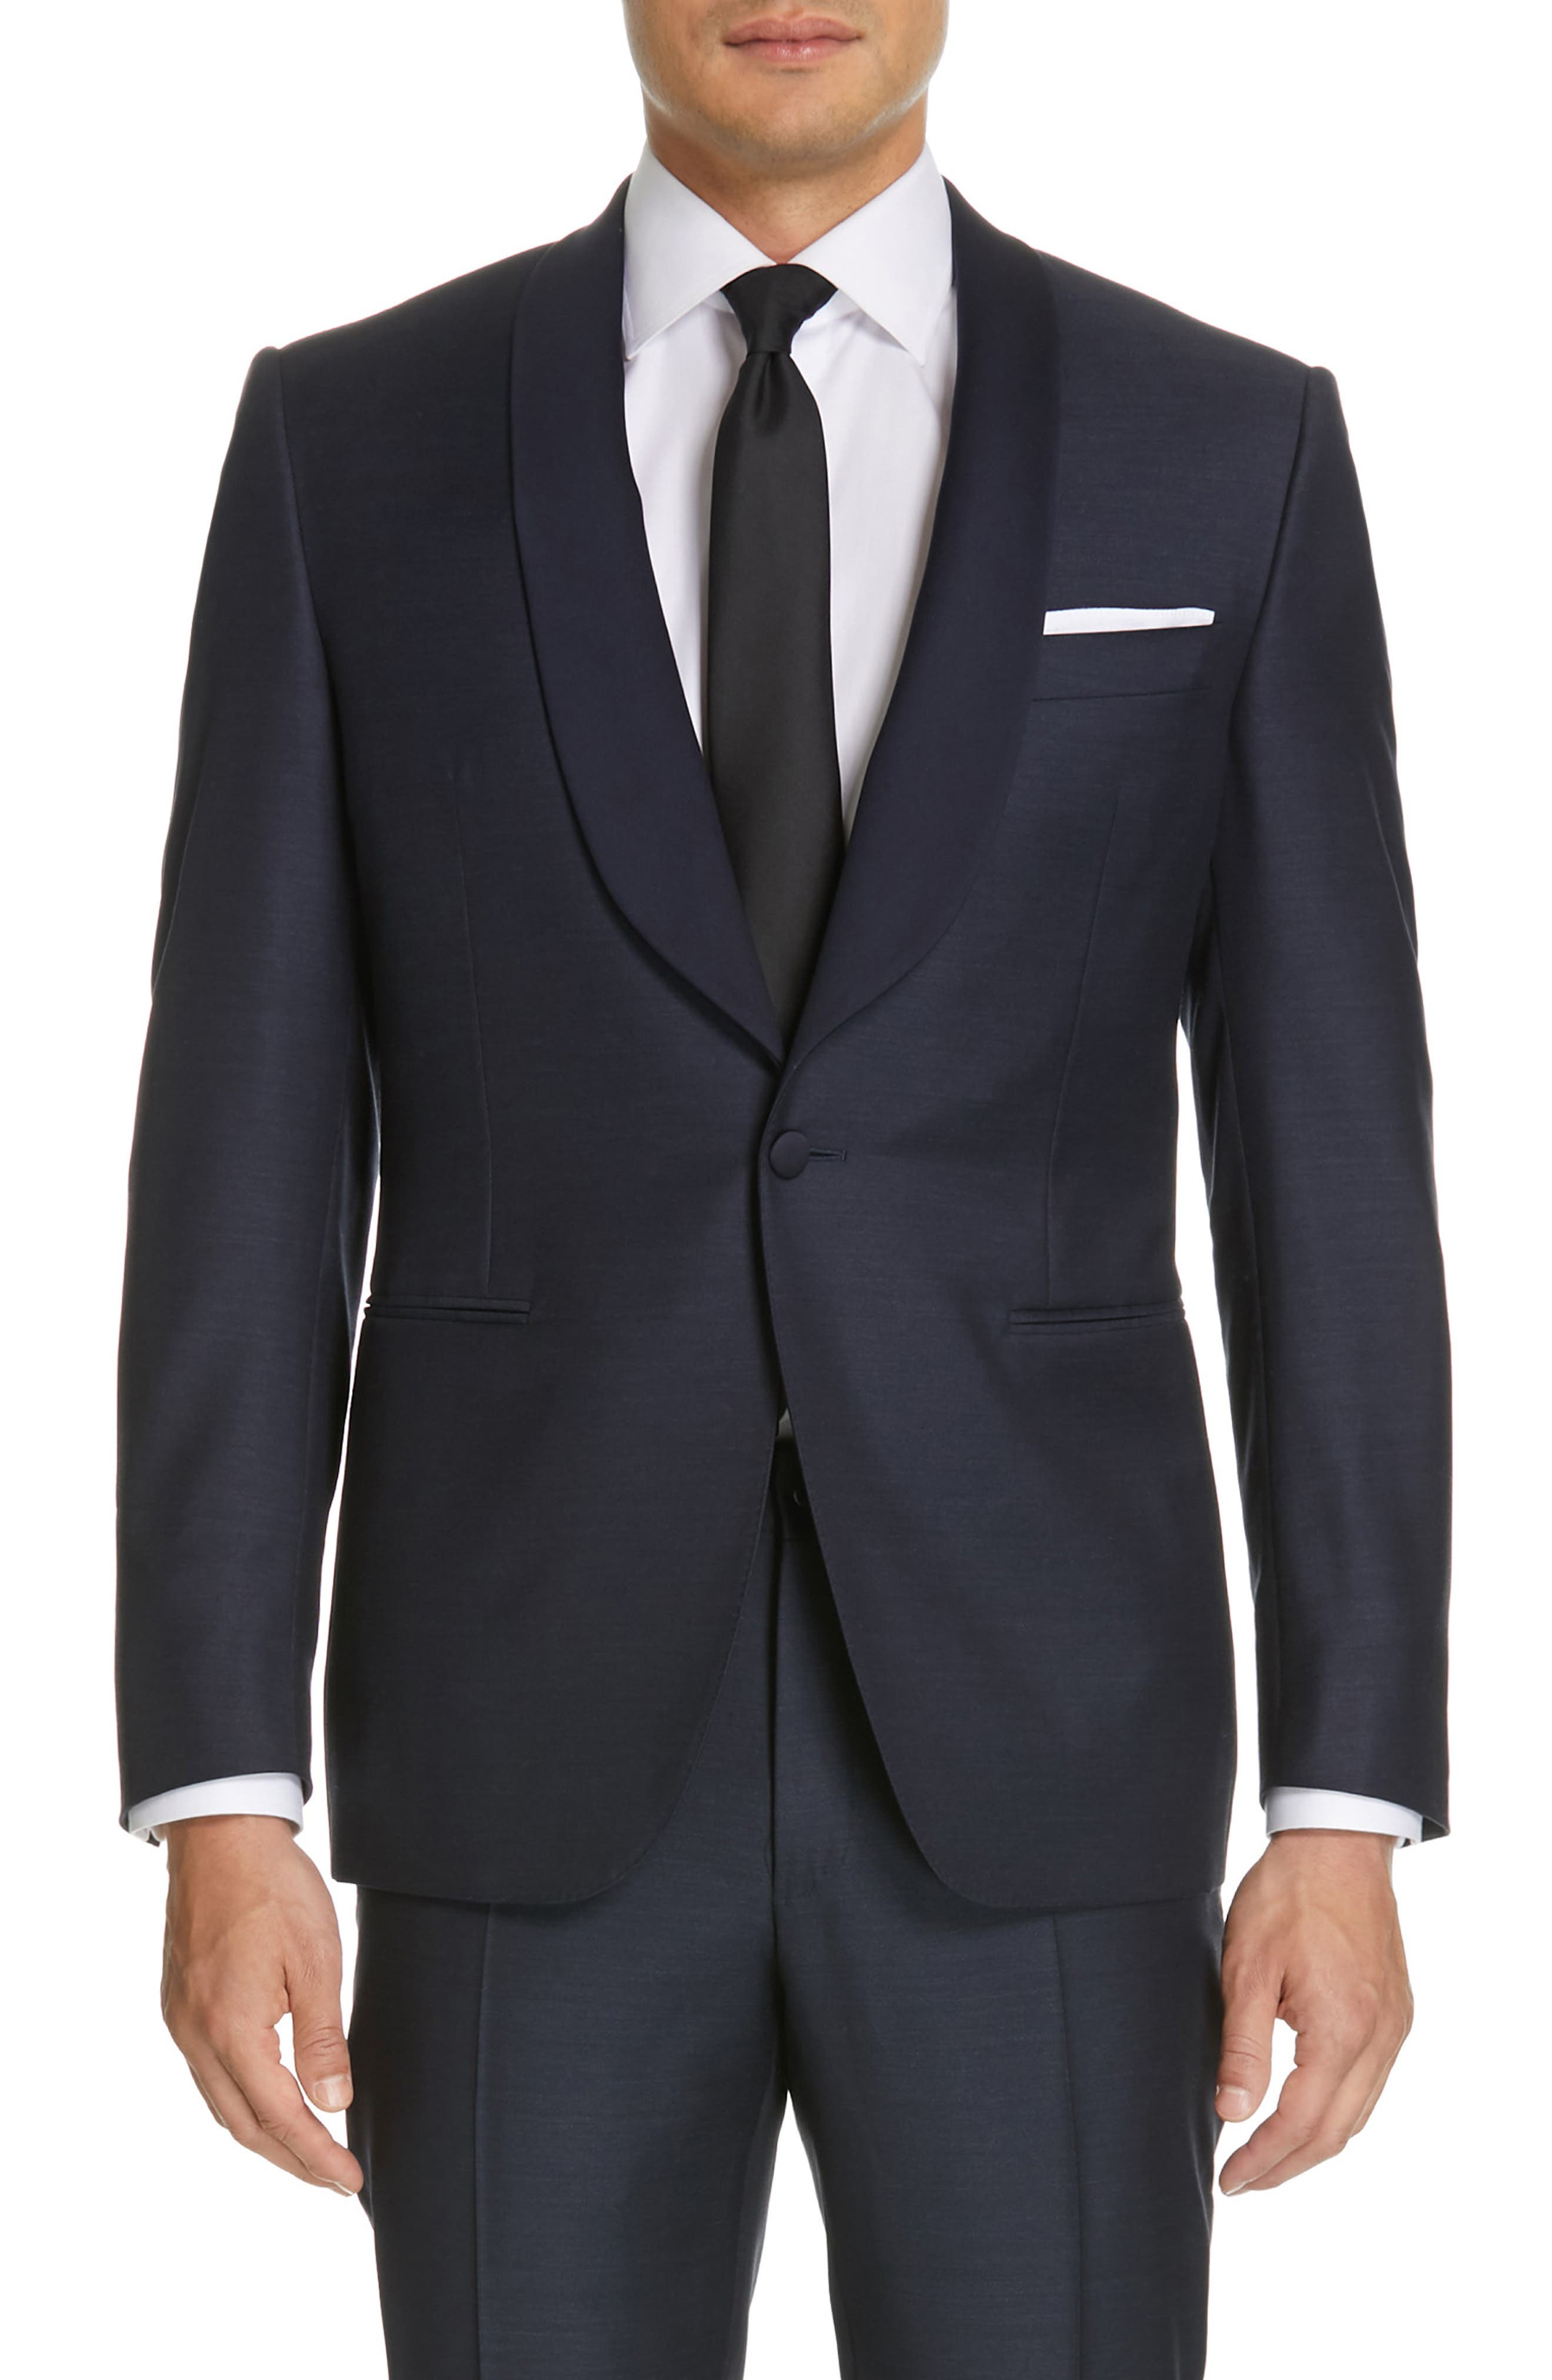 CANALI, Venieza Classic Fit Wool Tuxedo, Alternate thumbnail 5, color, NAVY